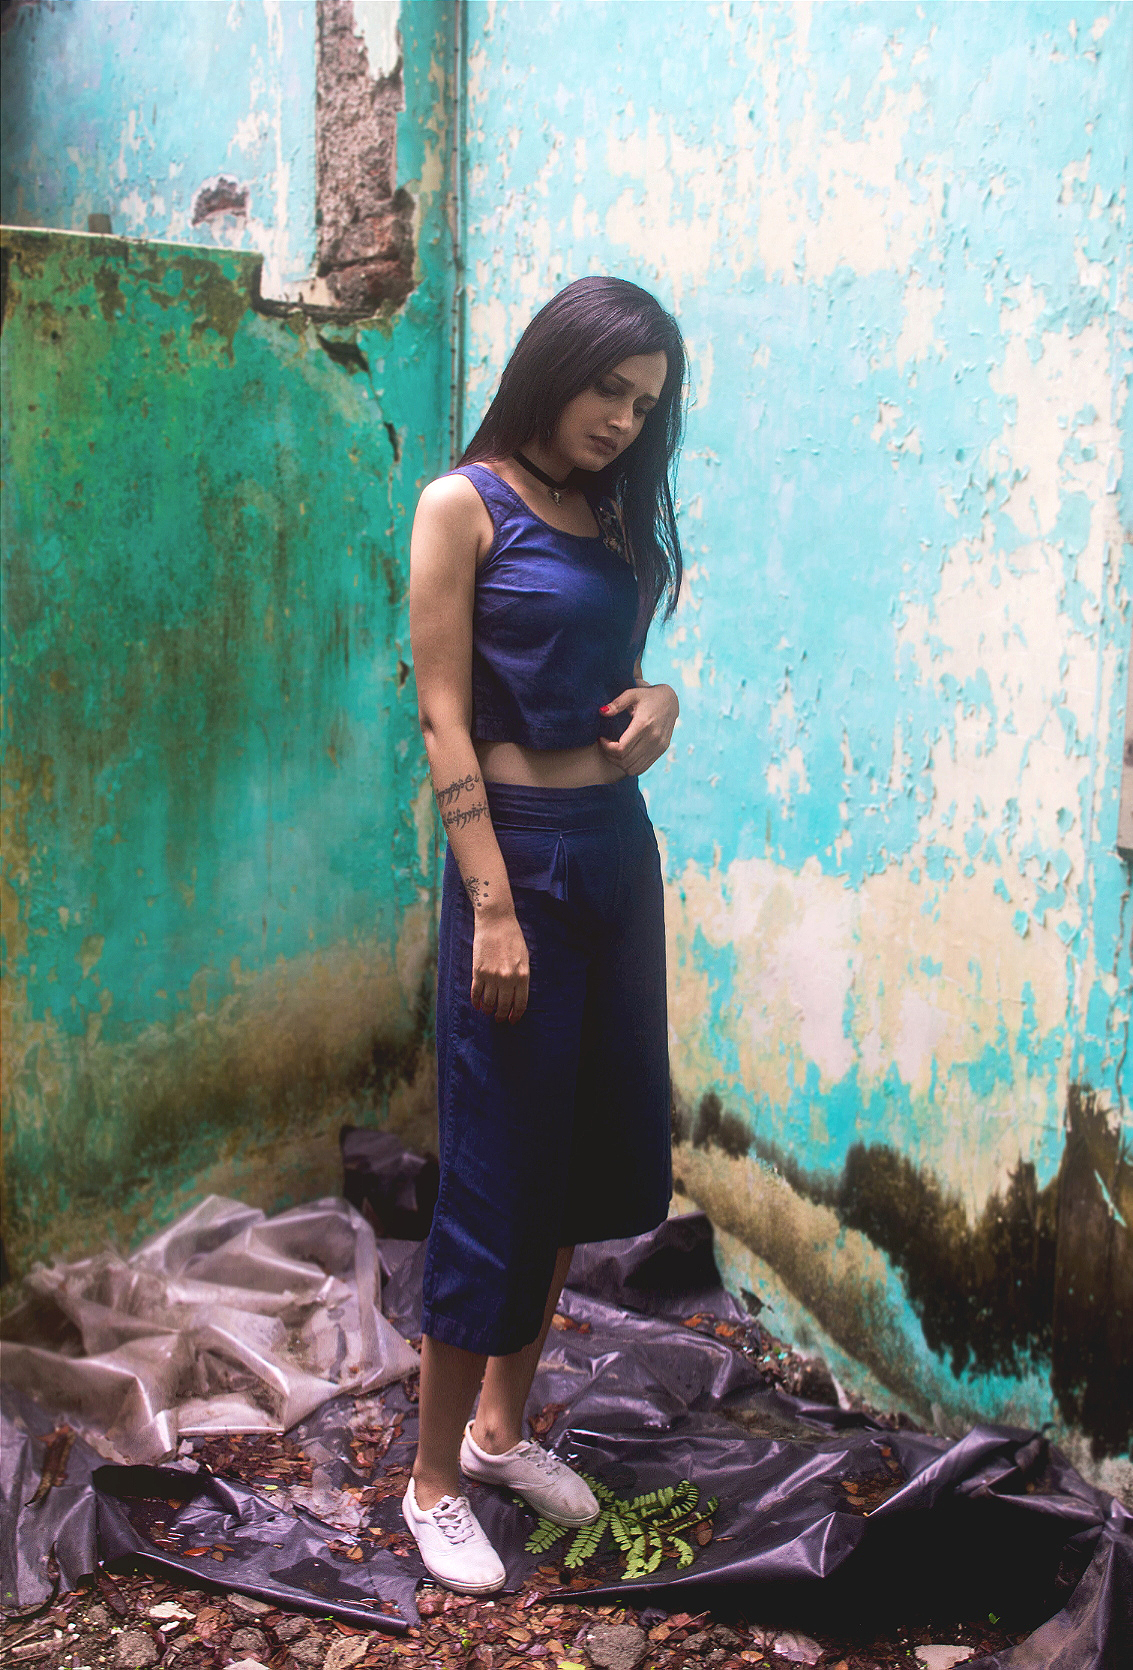 The-Chic-Armoire-by-Nidhi-Kunder-styleinme-Studio-Verandah-6